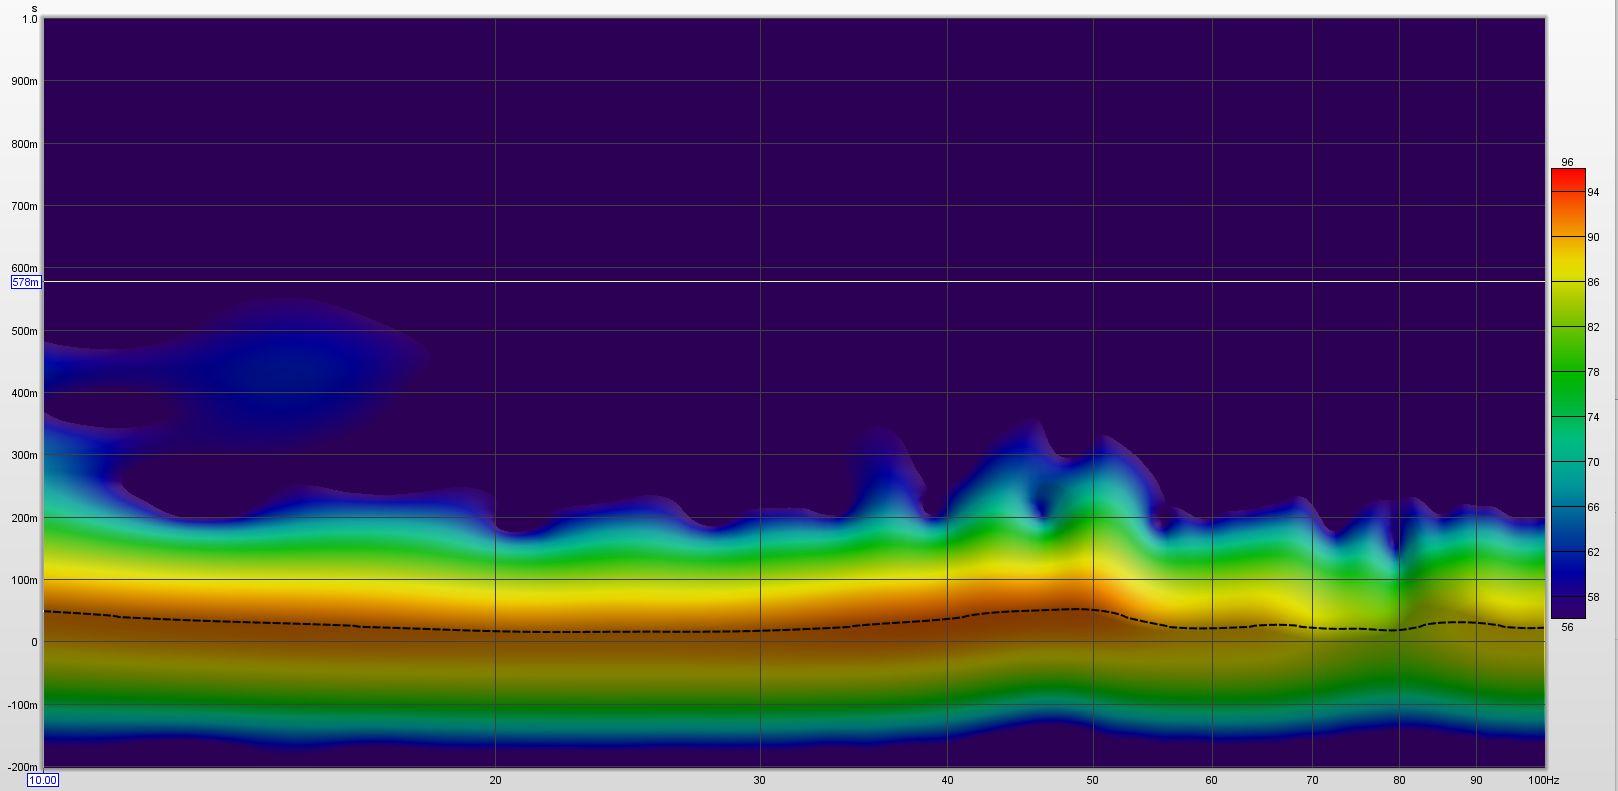 Dirac 2 spectrogram 10-100hz.jpg